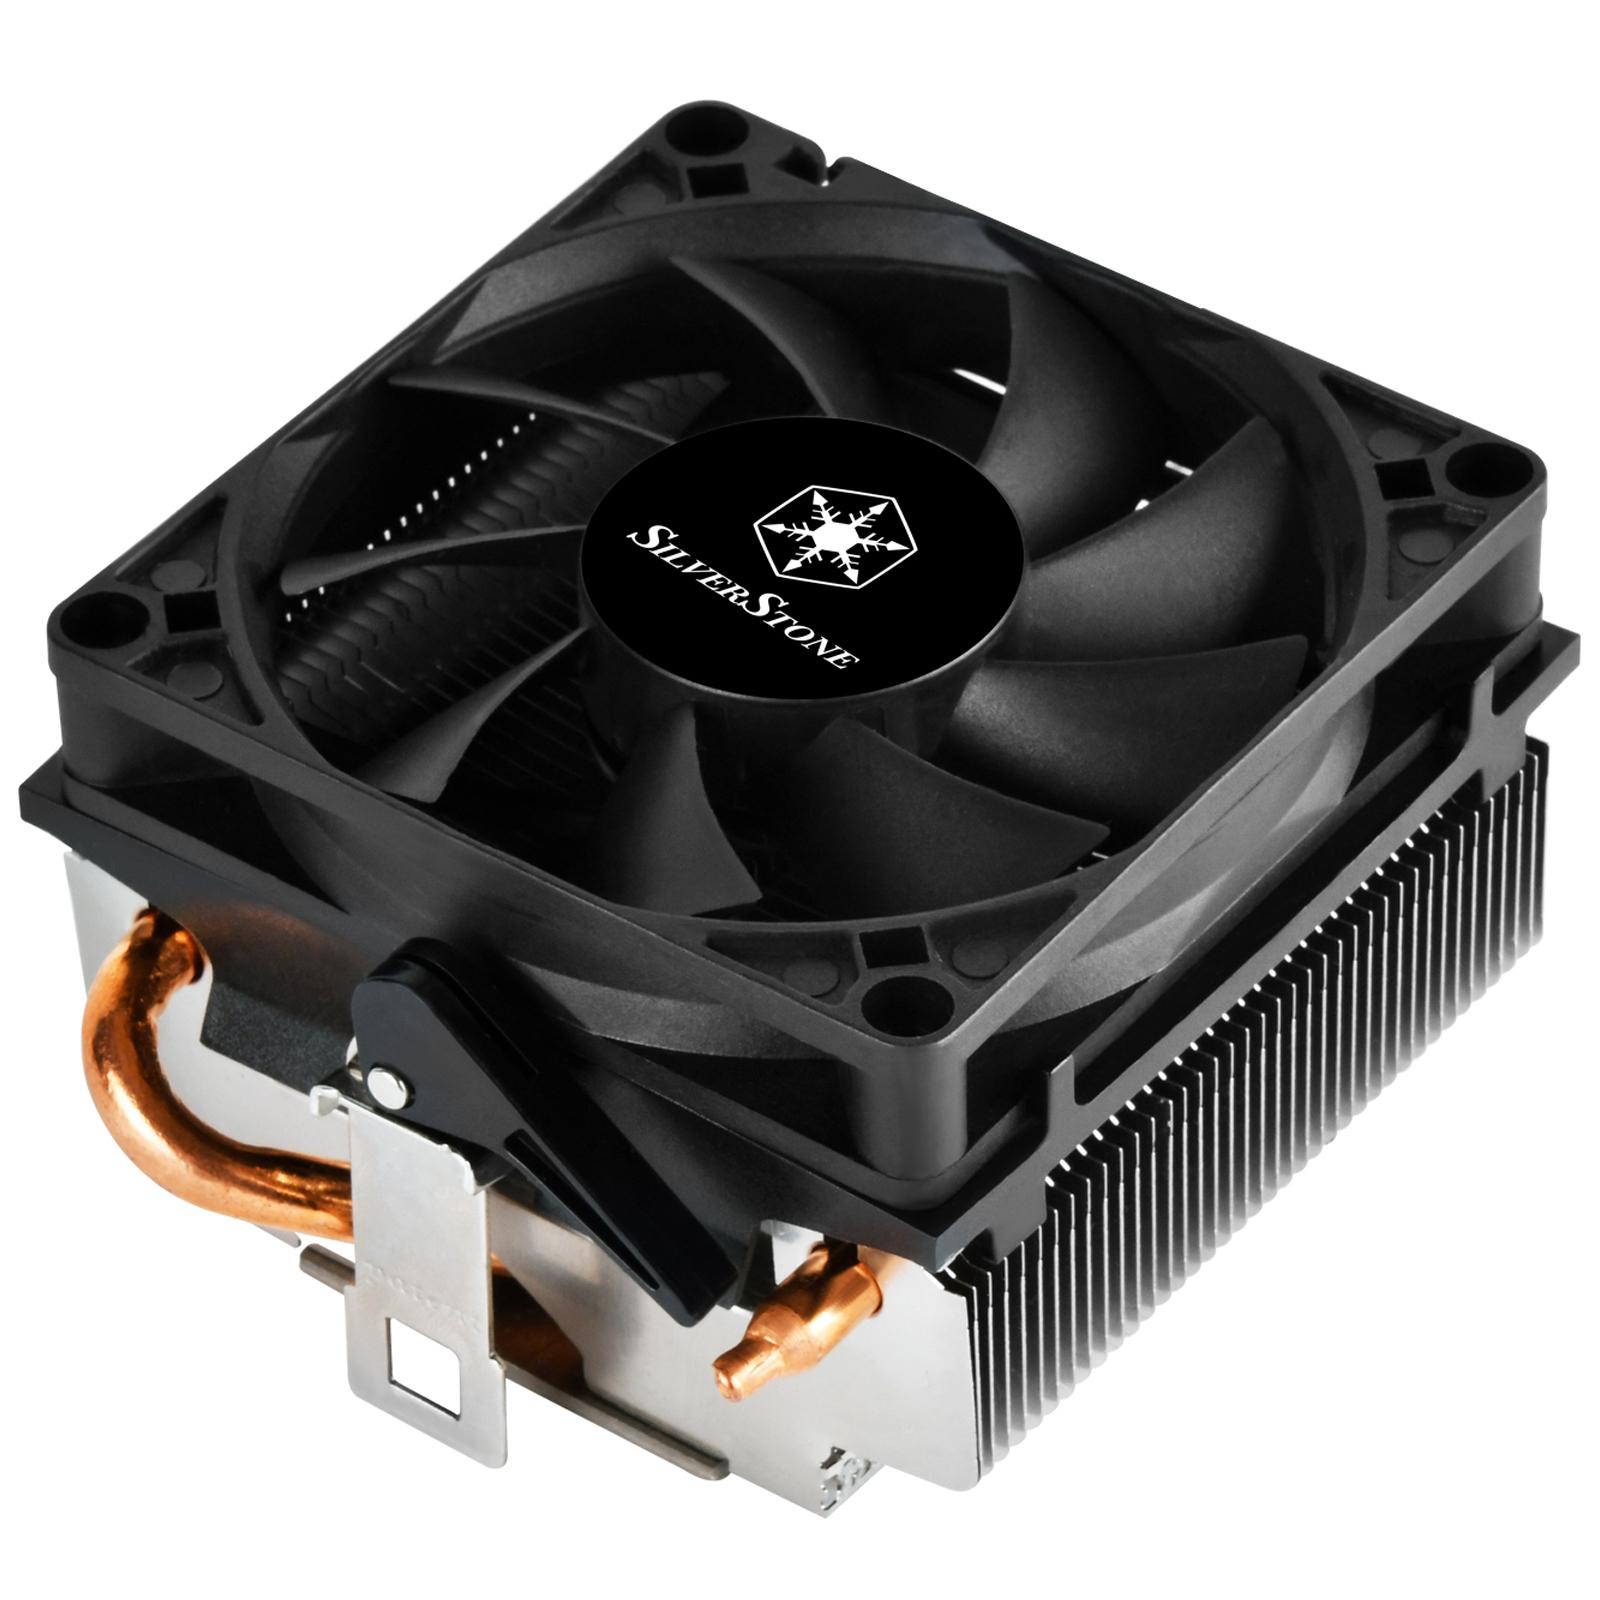 SilverStone KR01 Low Profile CPU Cooler